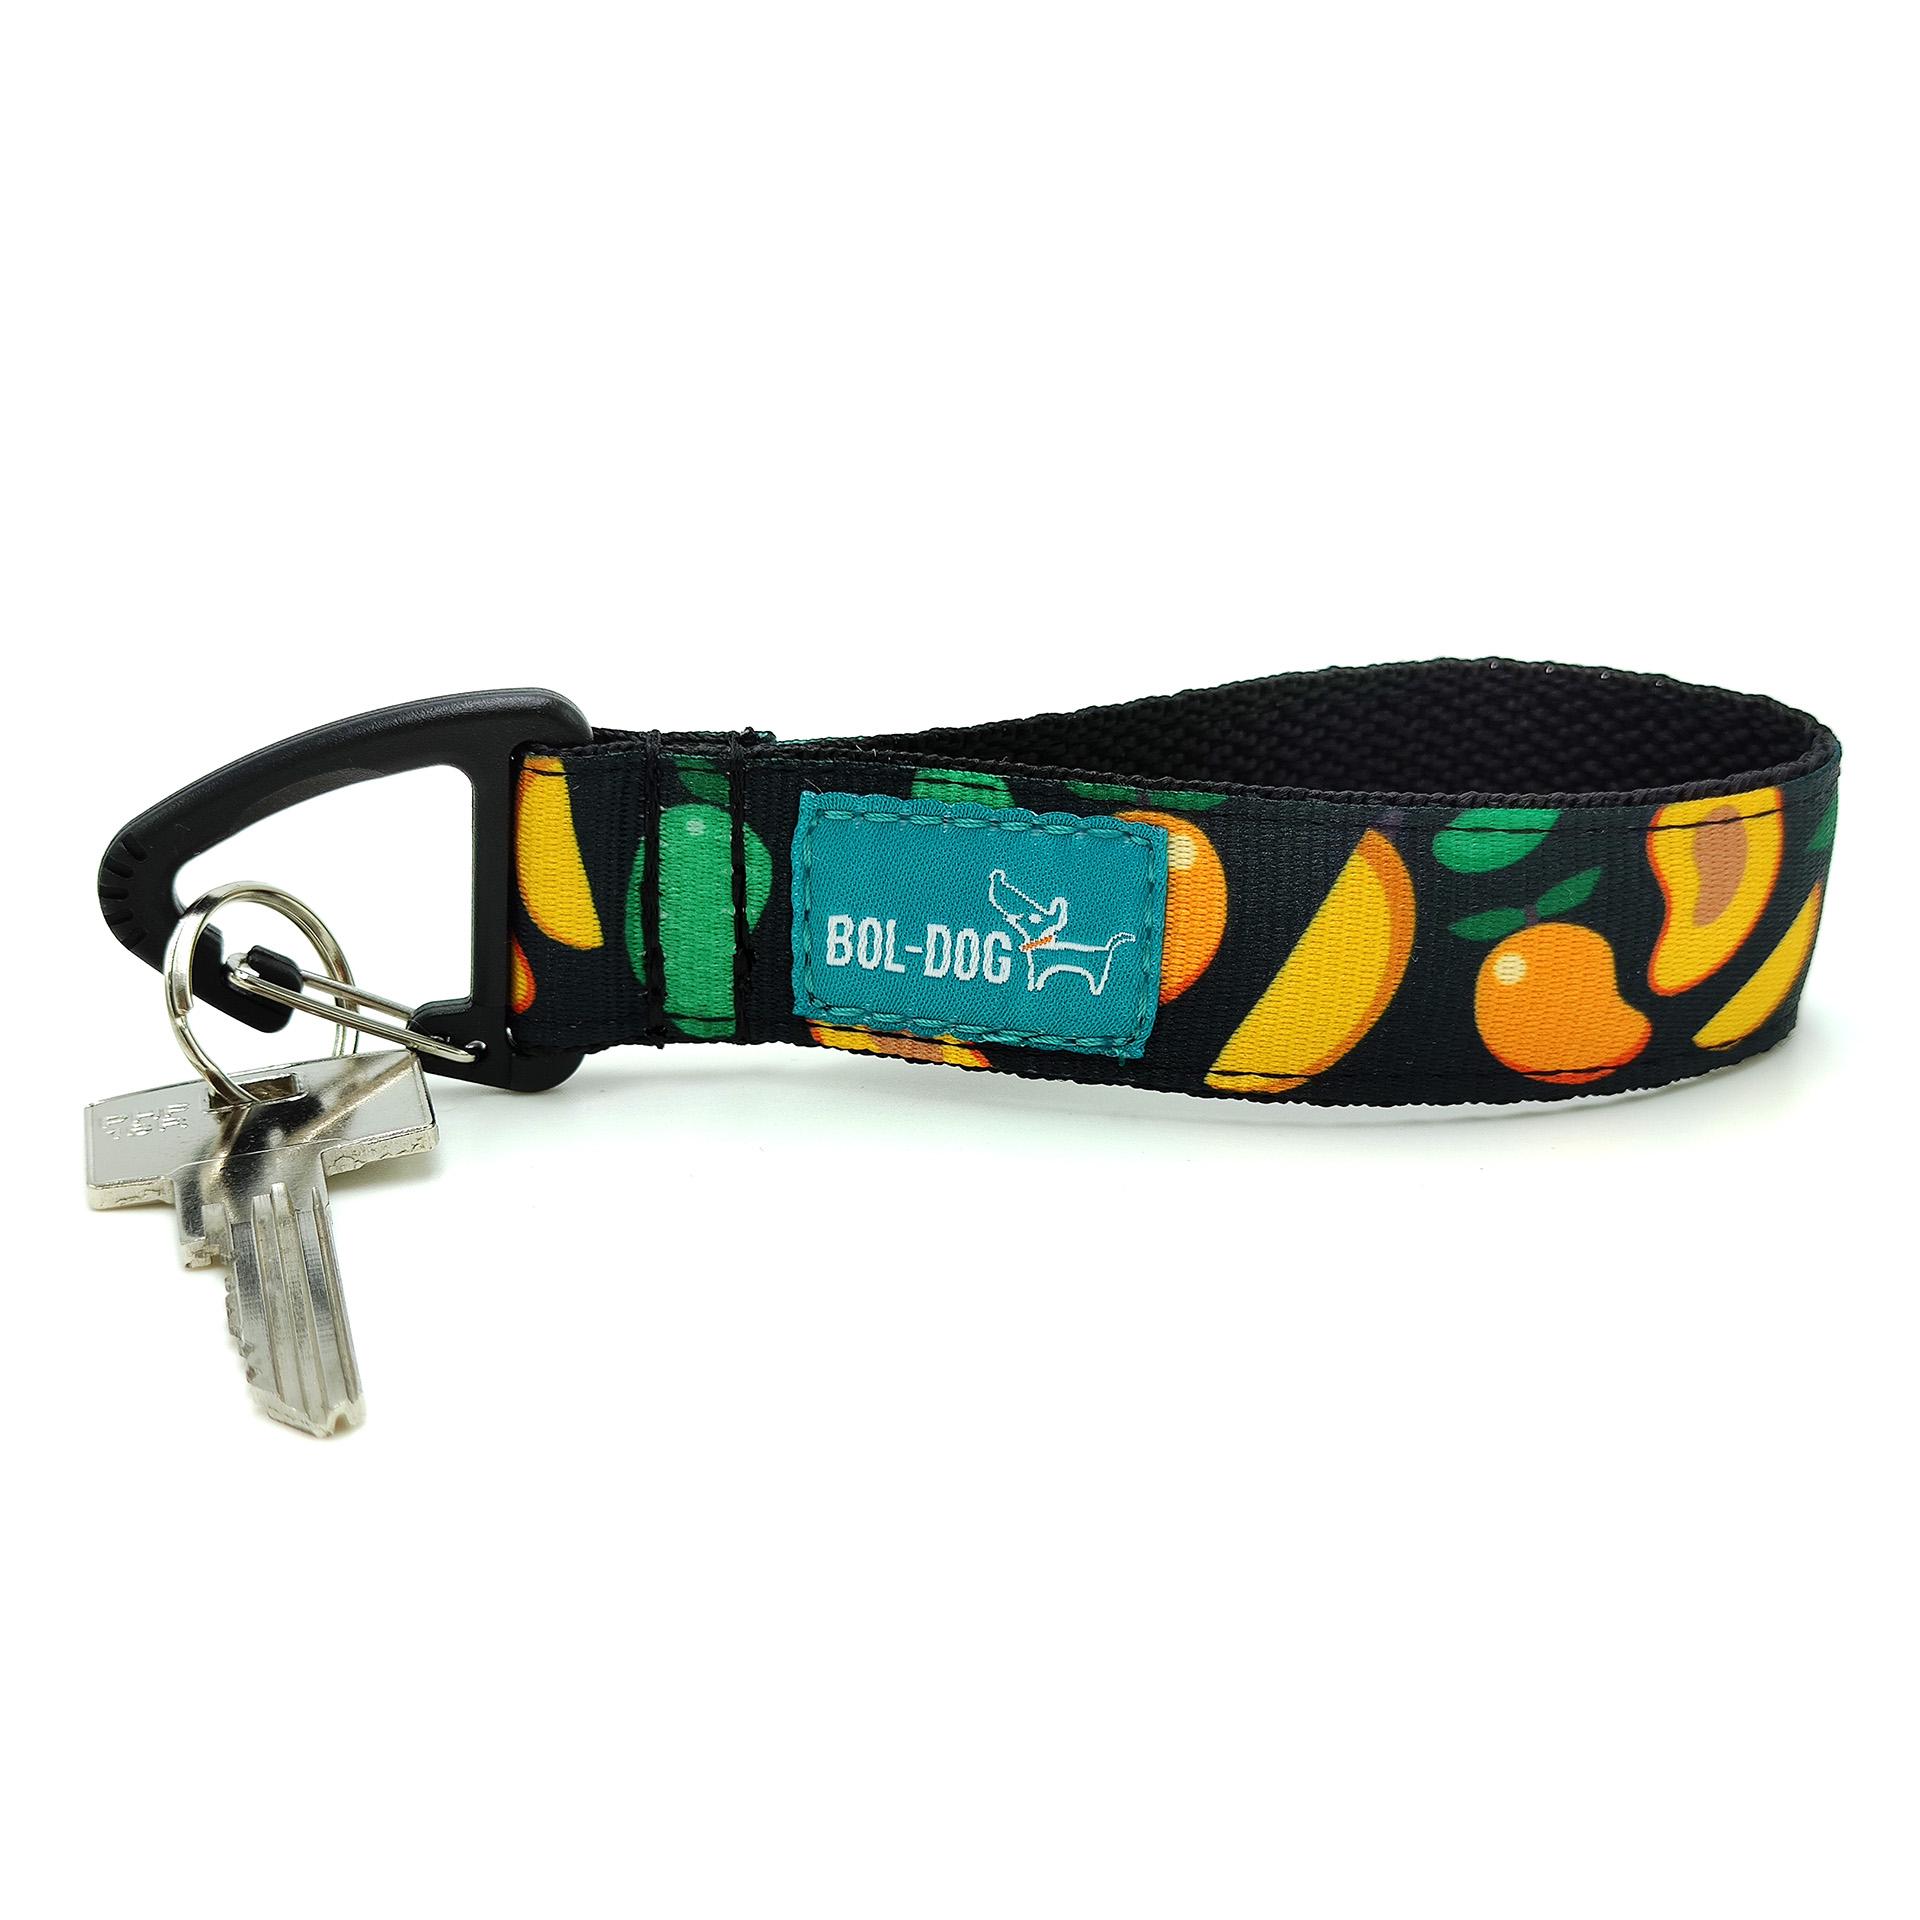 Mango key holder